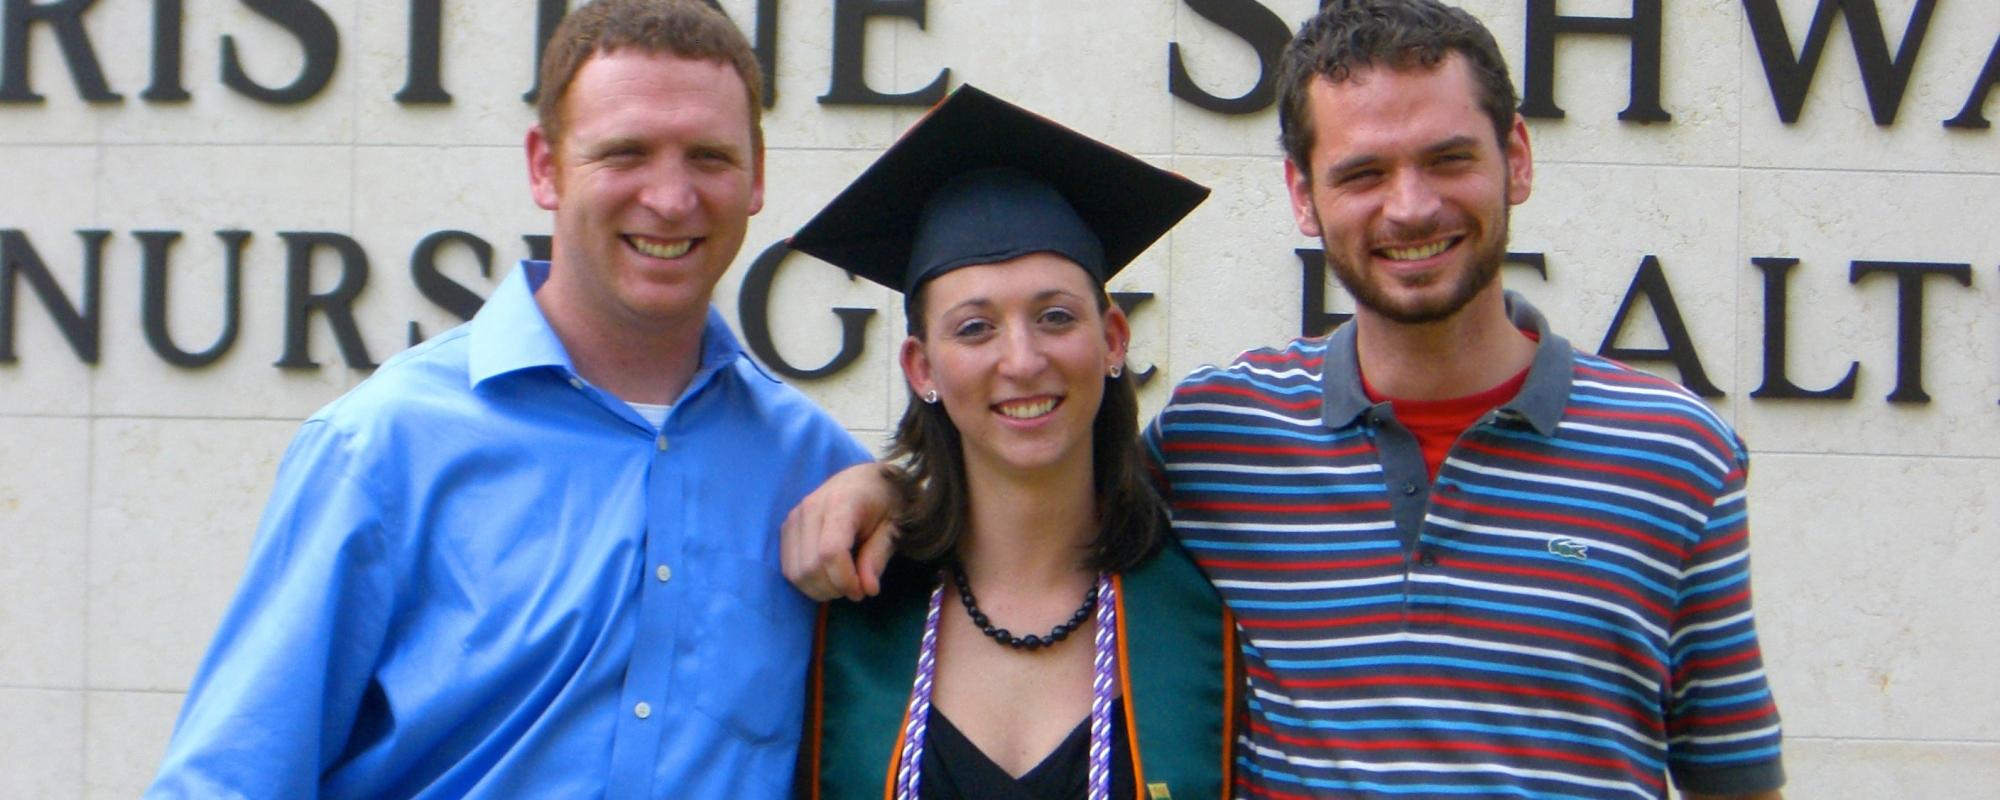 Graduating-Nursing-School-at-the-U